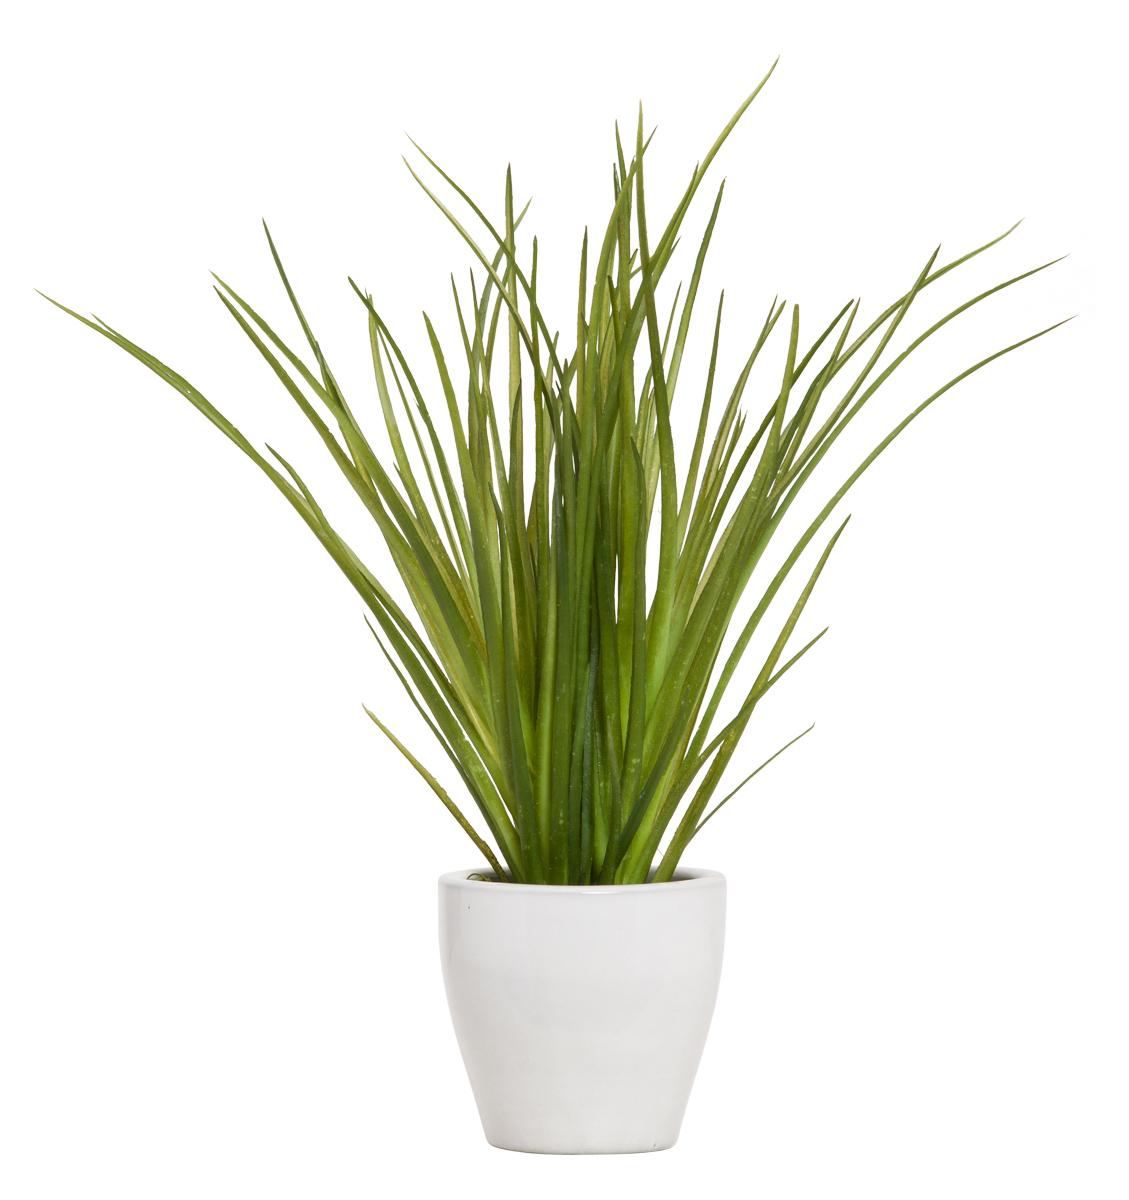 GRASS IN WHITE POT